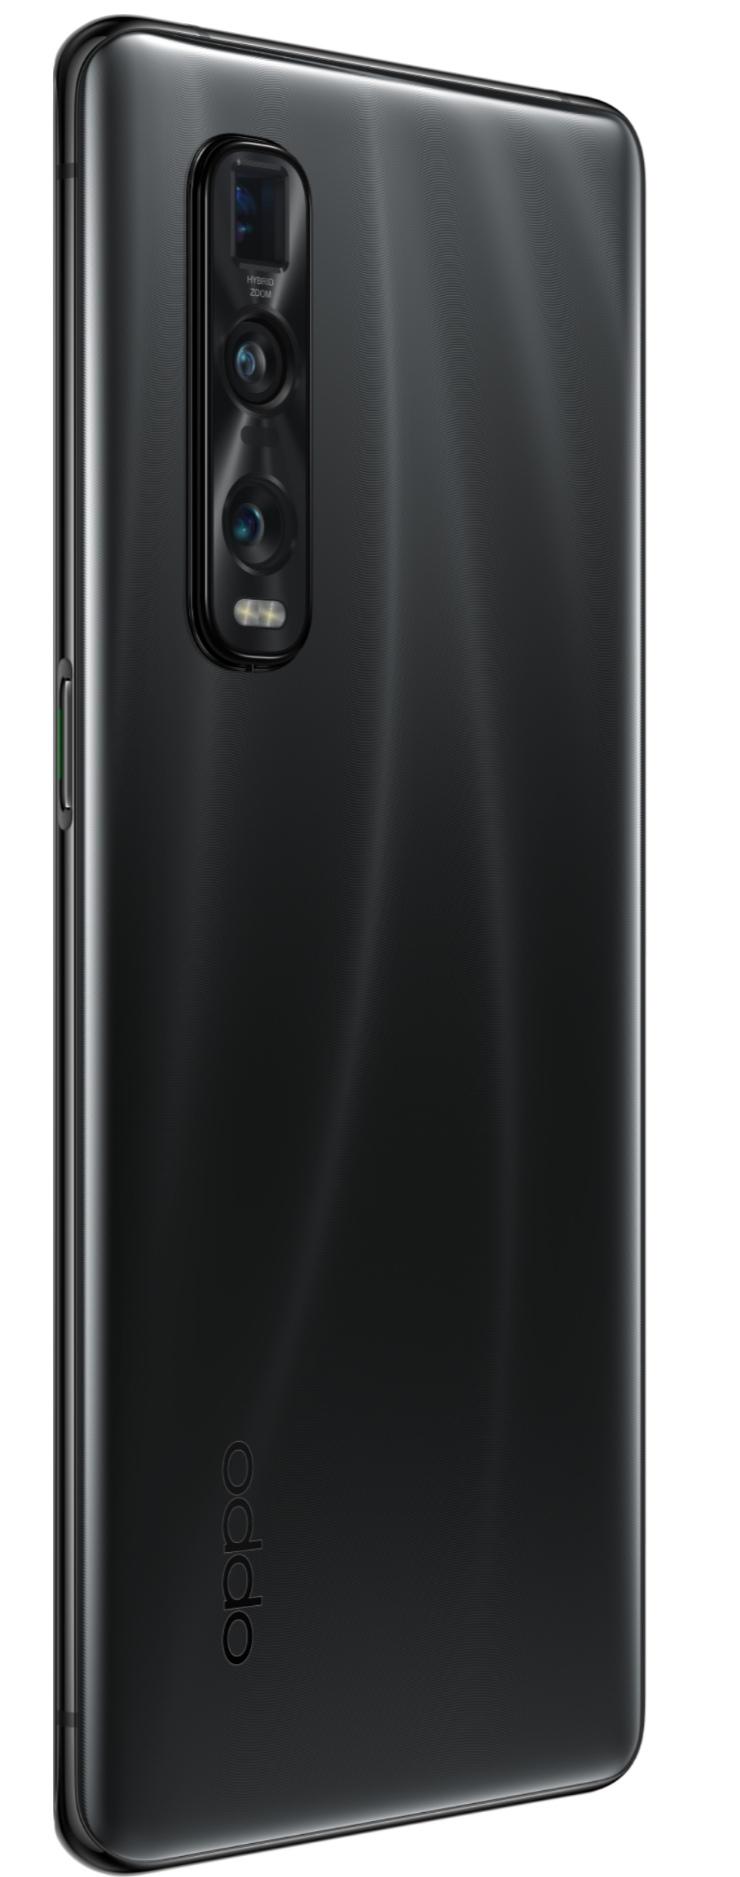 OPPO تعلن عن إطلاق هاتف  Pro Find X2 في السوق المصري